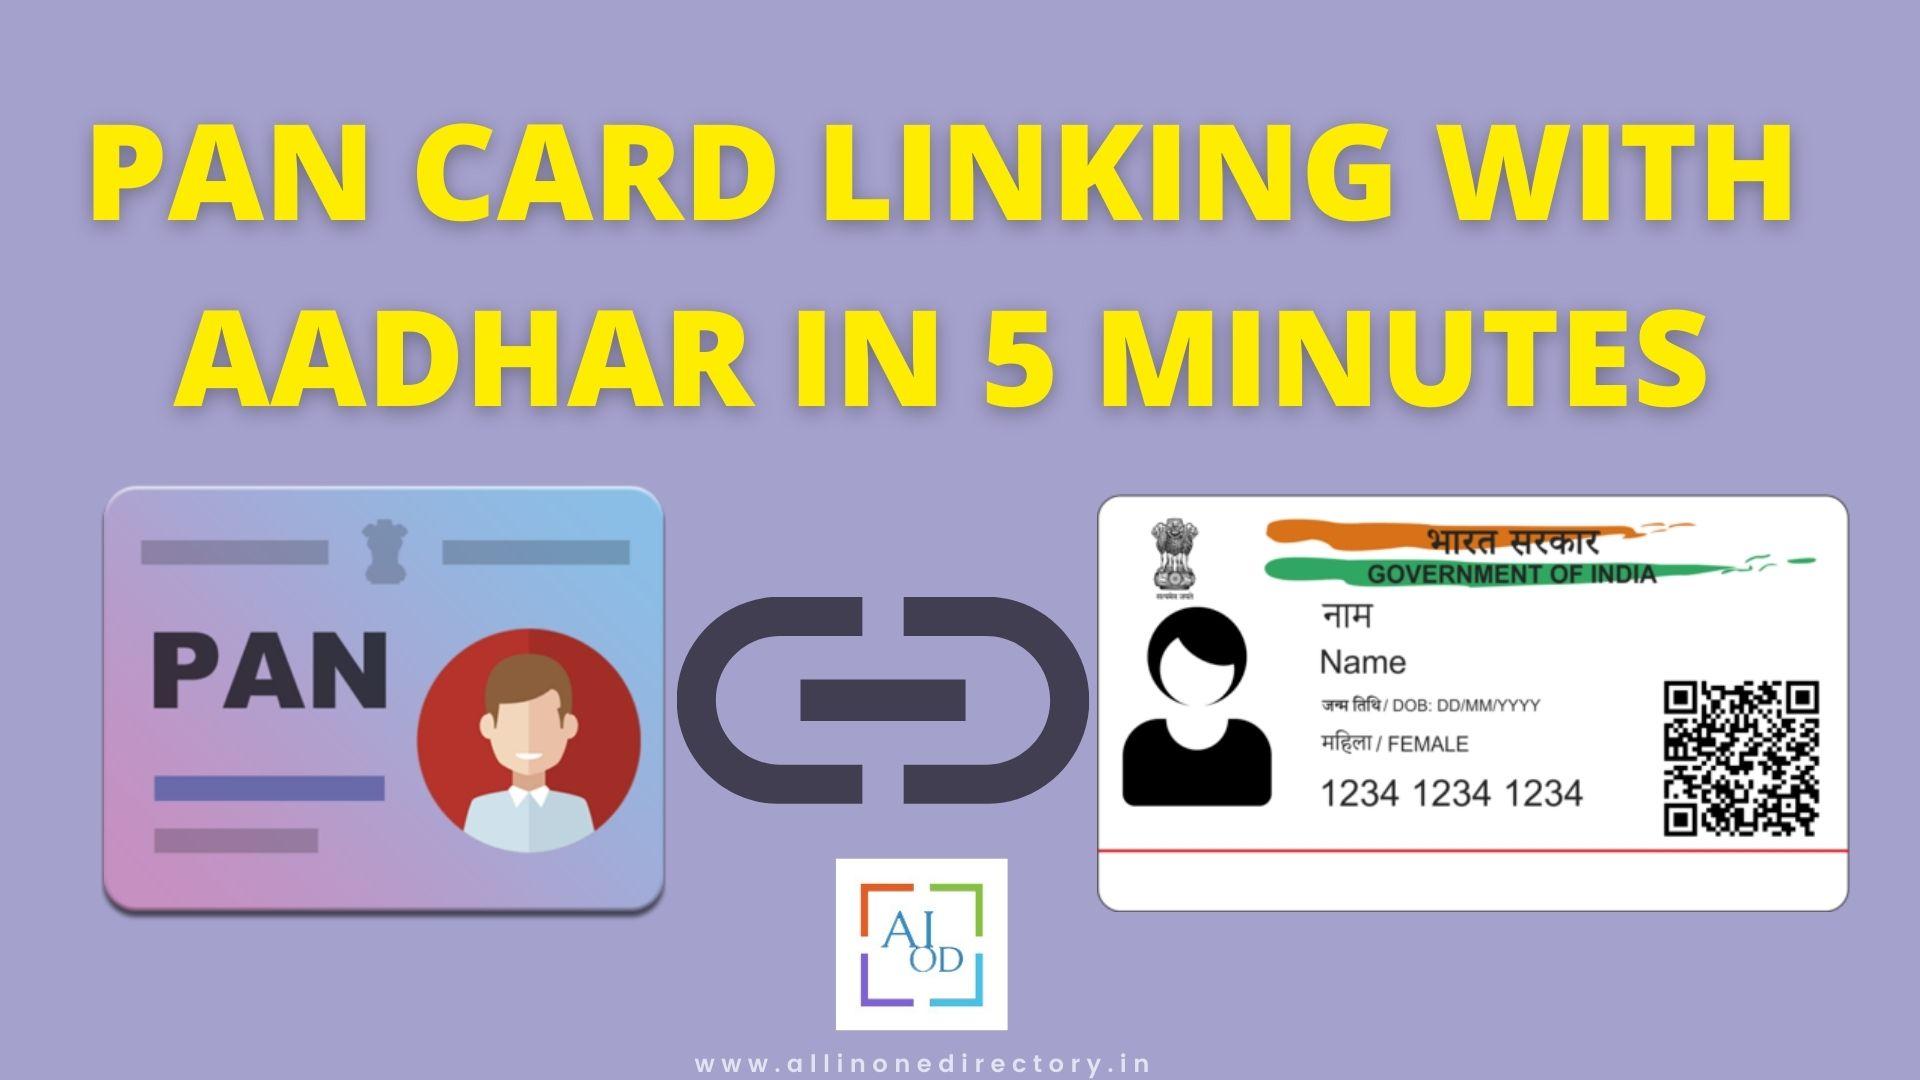 Simple Steps To Link PAN Card With Aadhar Card